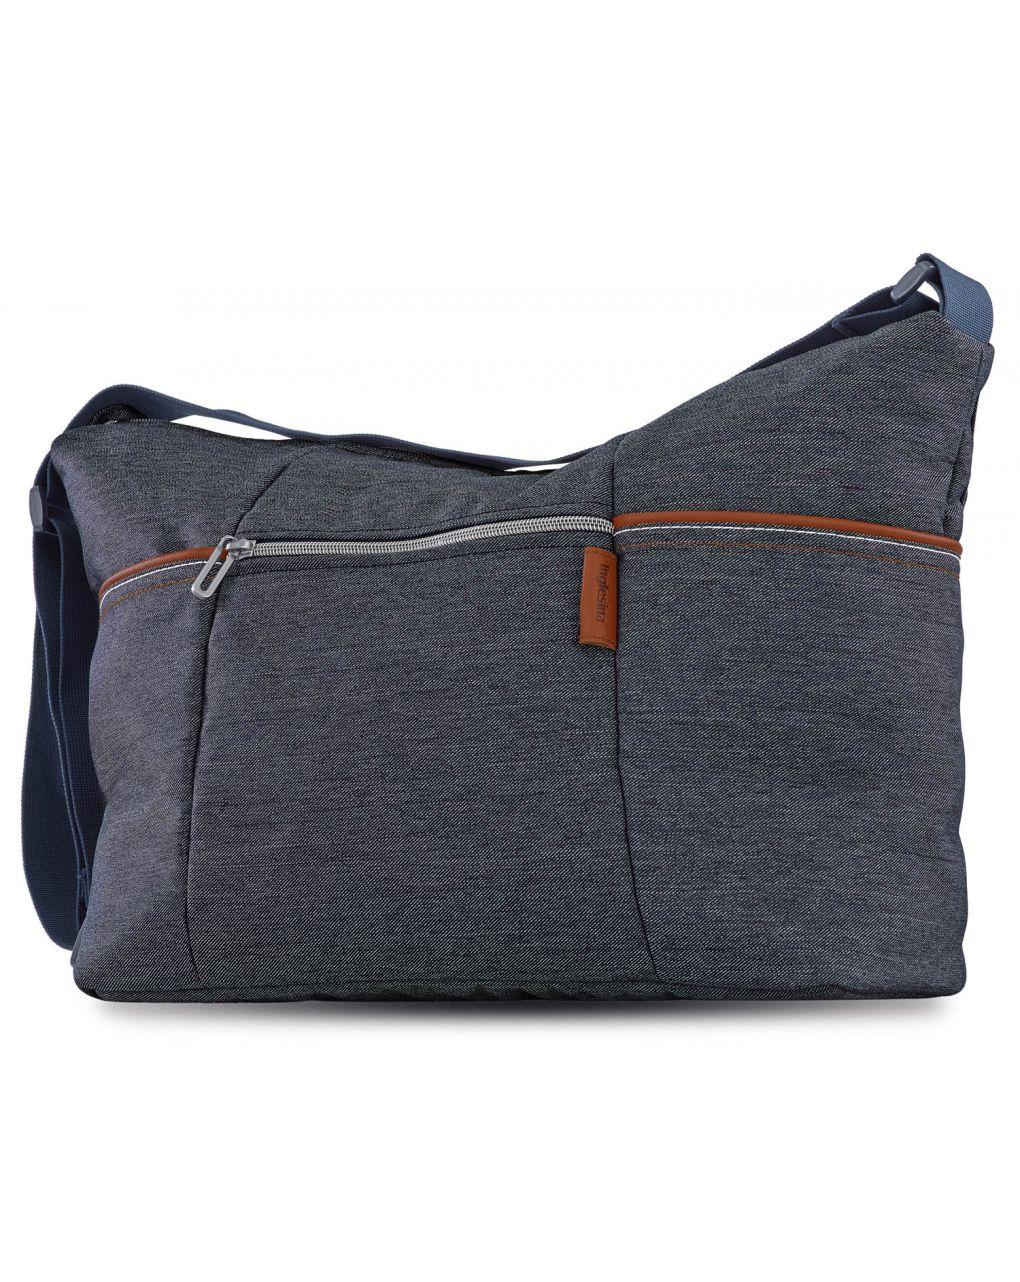 Inglesina Trilogy Day Bag Τσάντα-Αλλαξιέρα, Village Denim